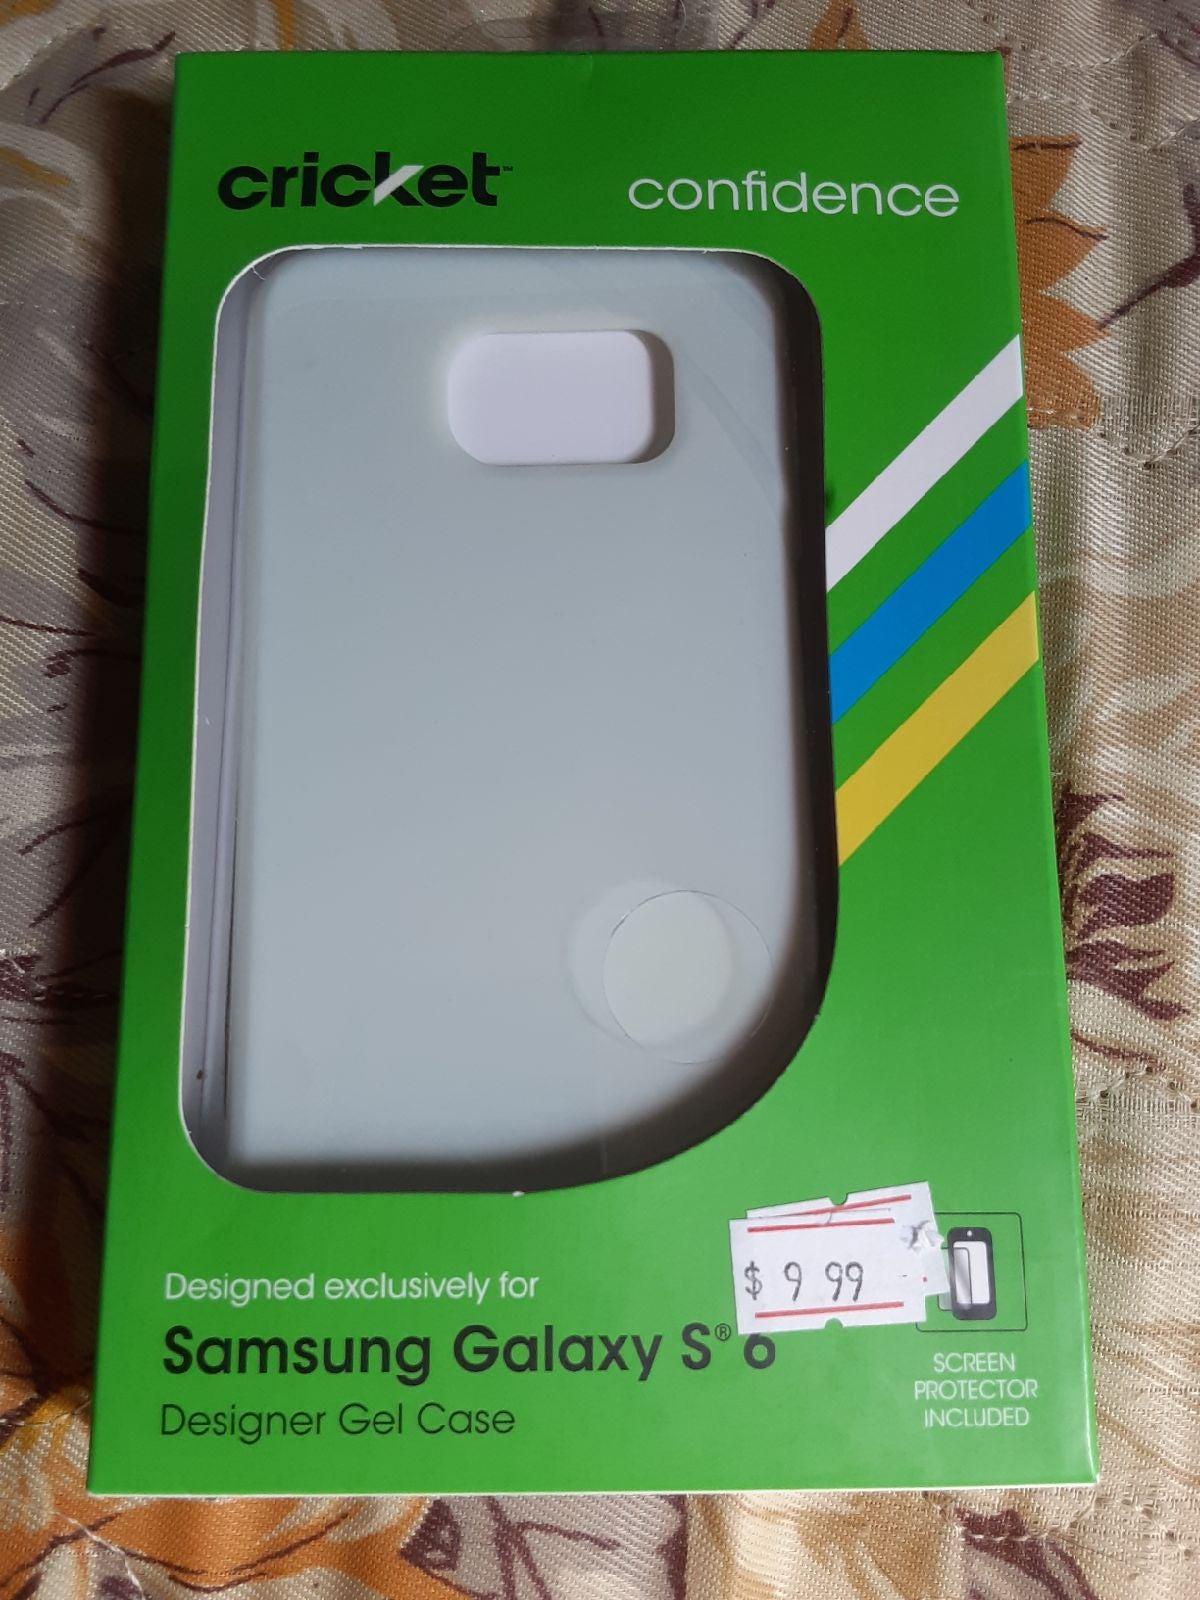 Samsung Galaxy S6 phone case